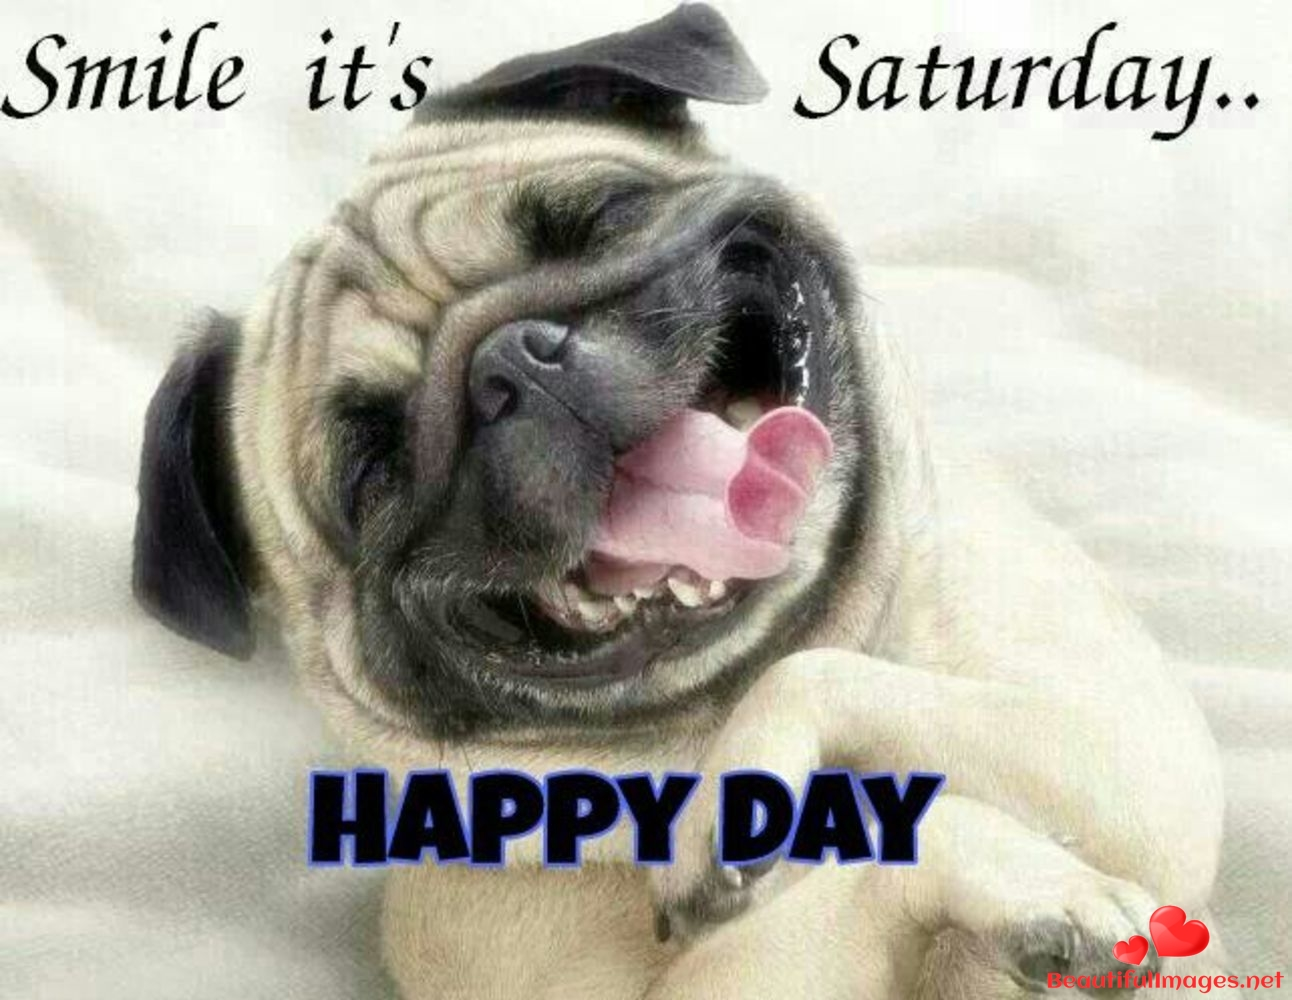 Good-morning-happy-saturday-facebook-whatsapp-images-nice-708